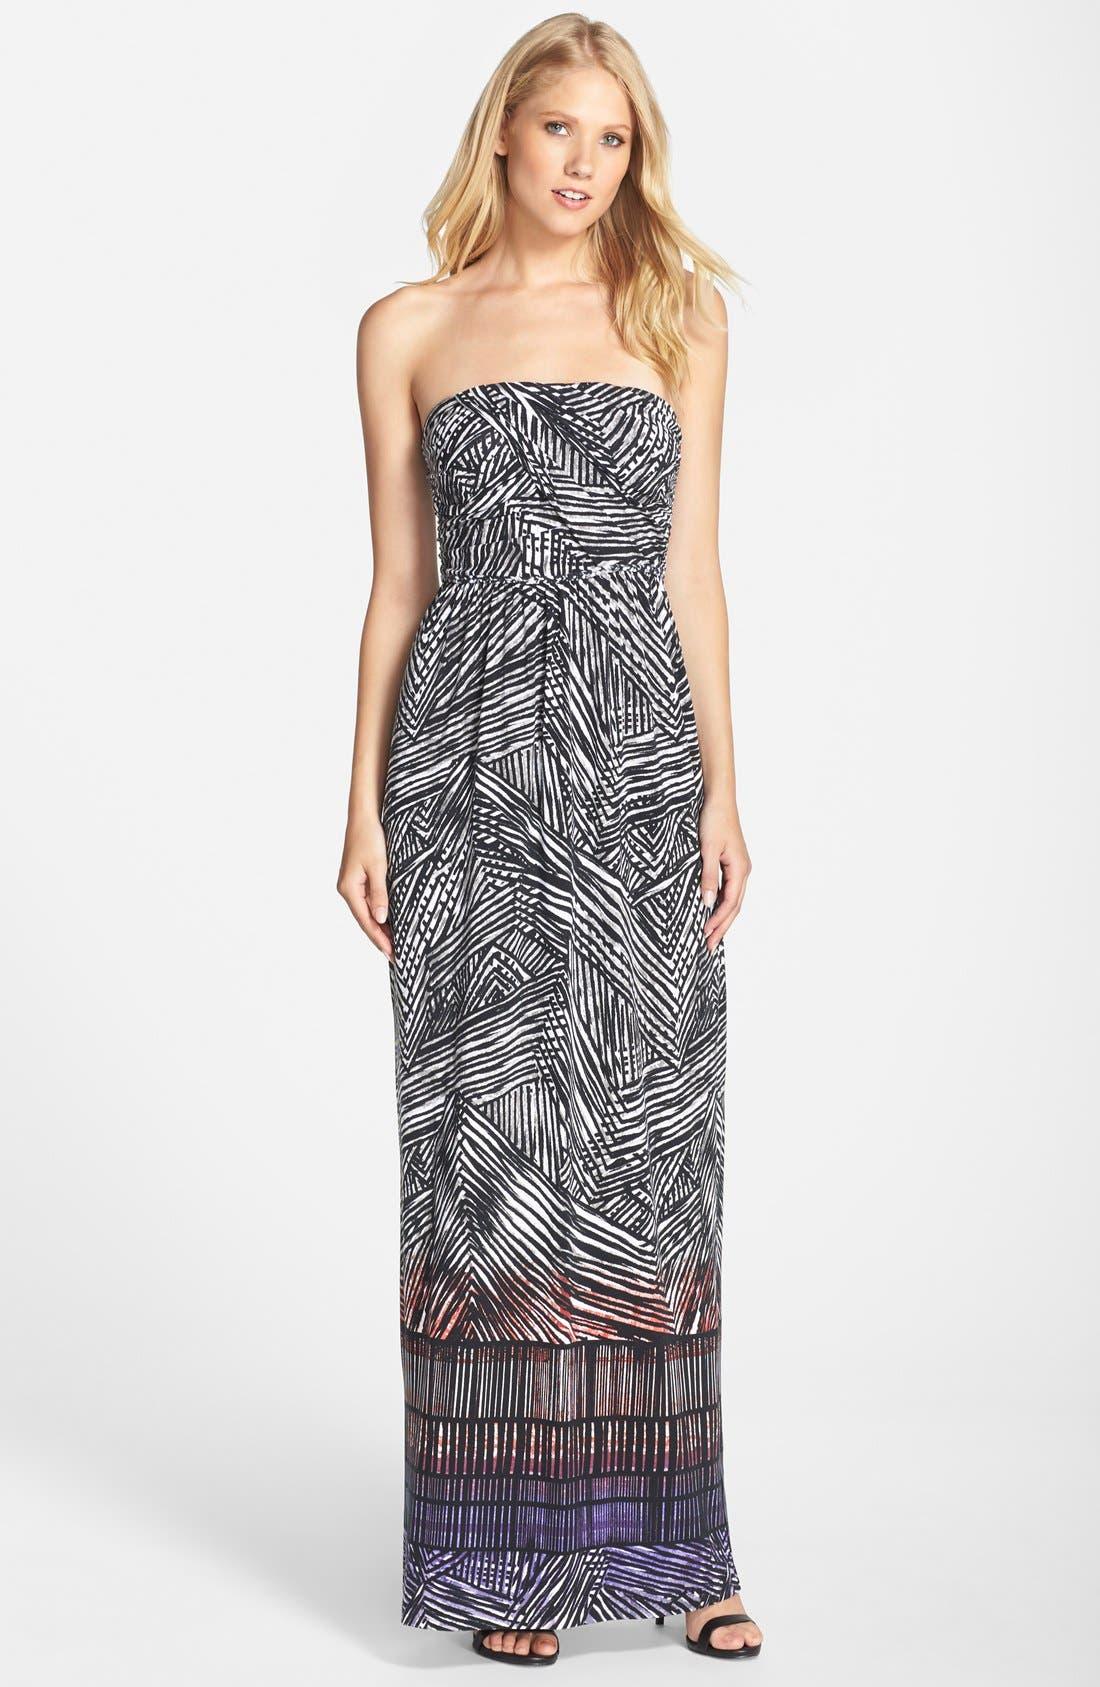 Alternate Image 1 Selected - Tart 'Delancy' Print Jersey Maxi Dress